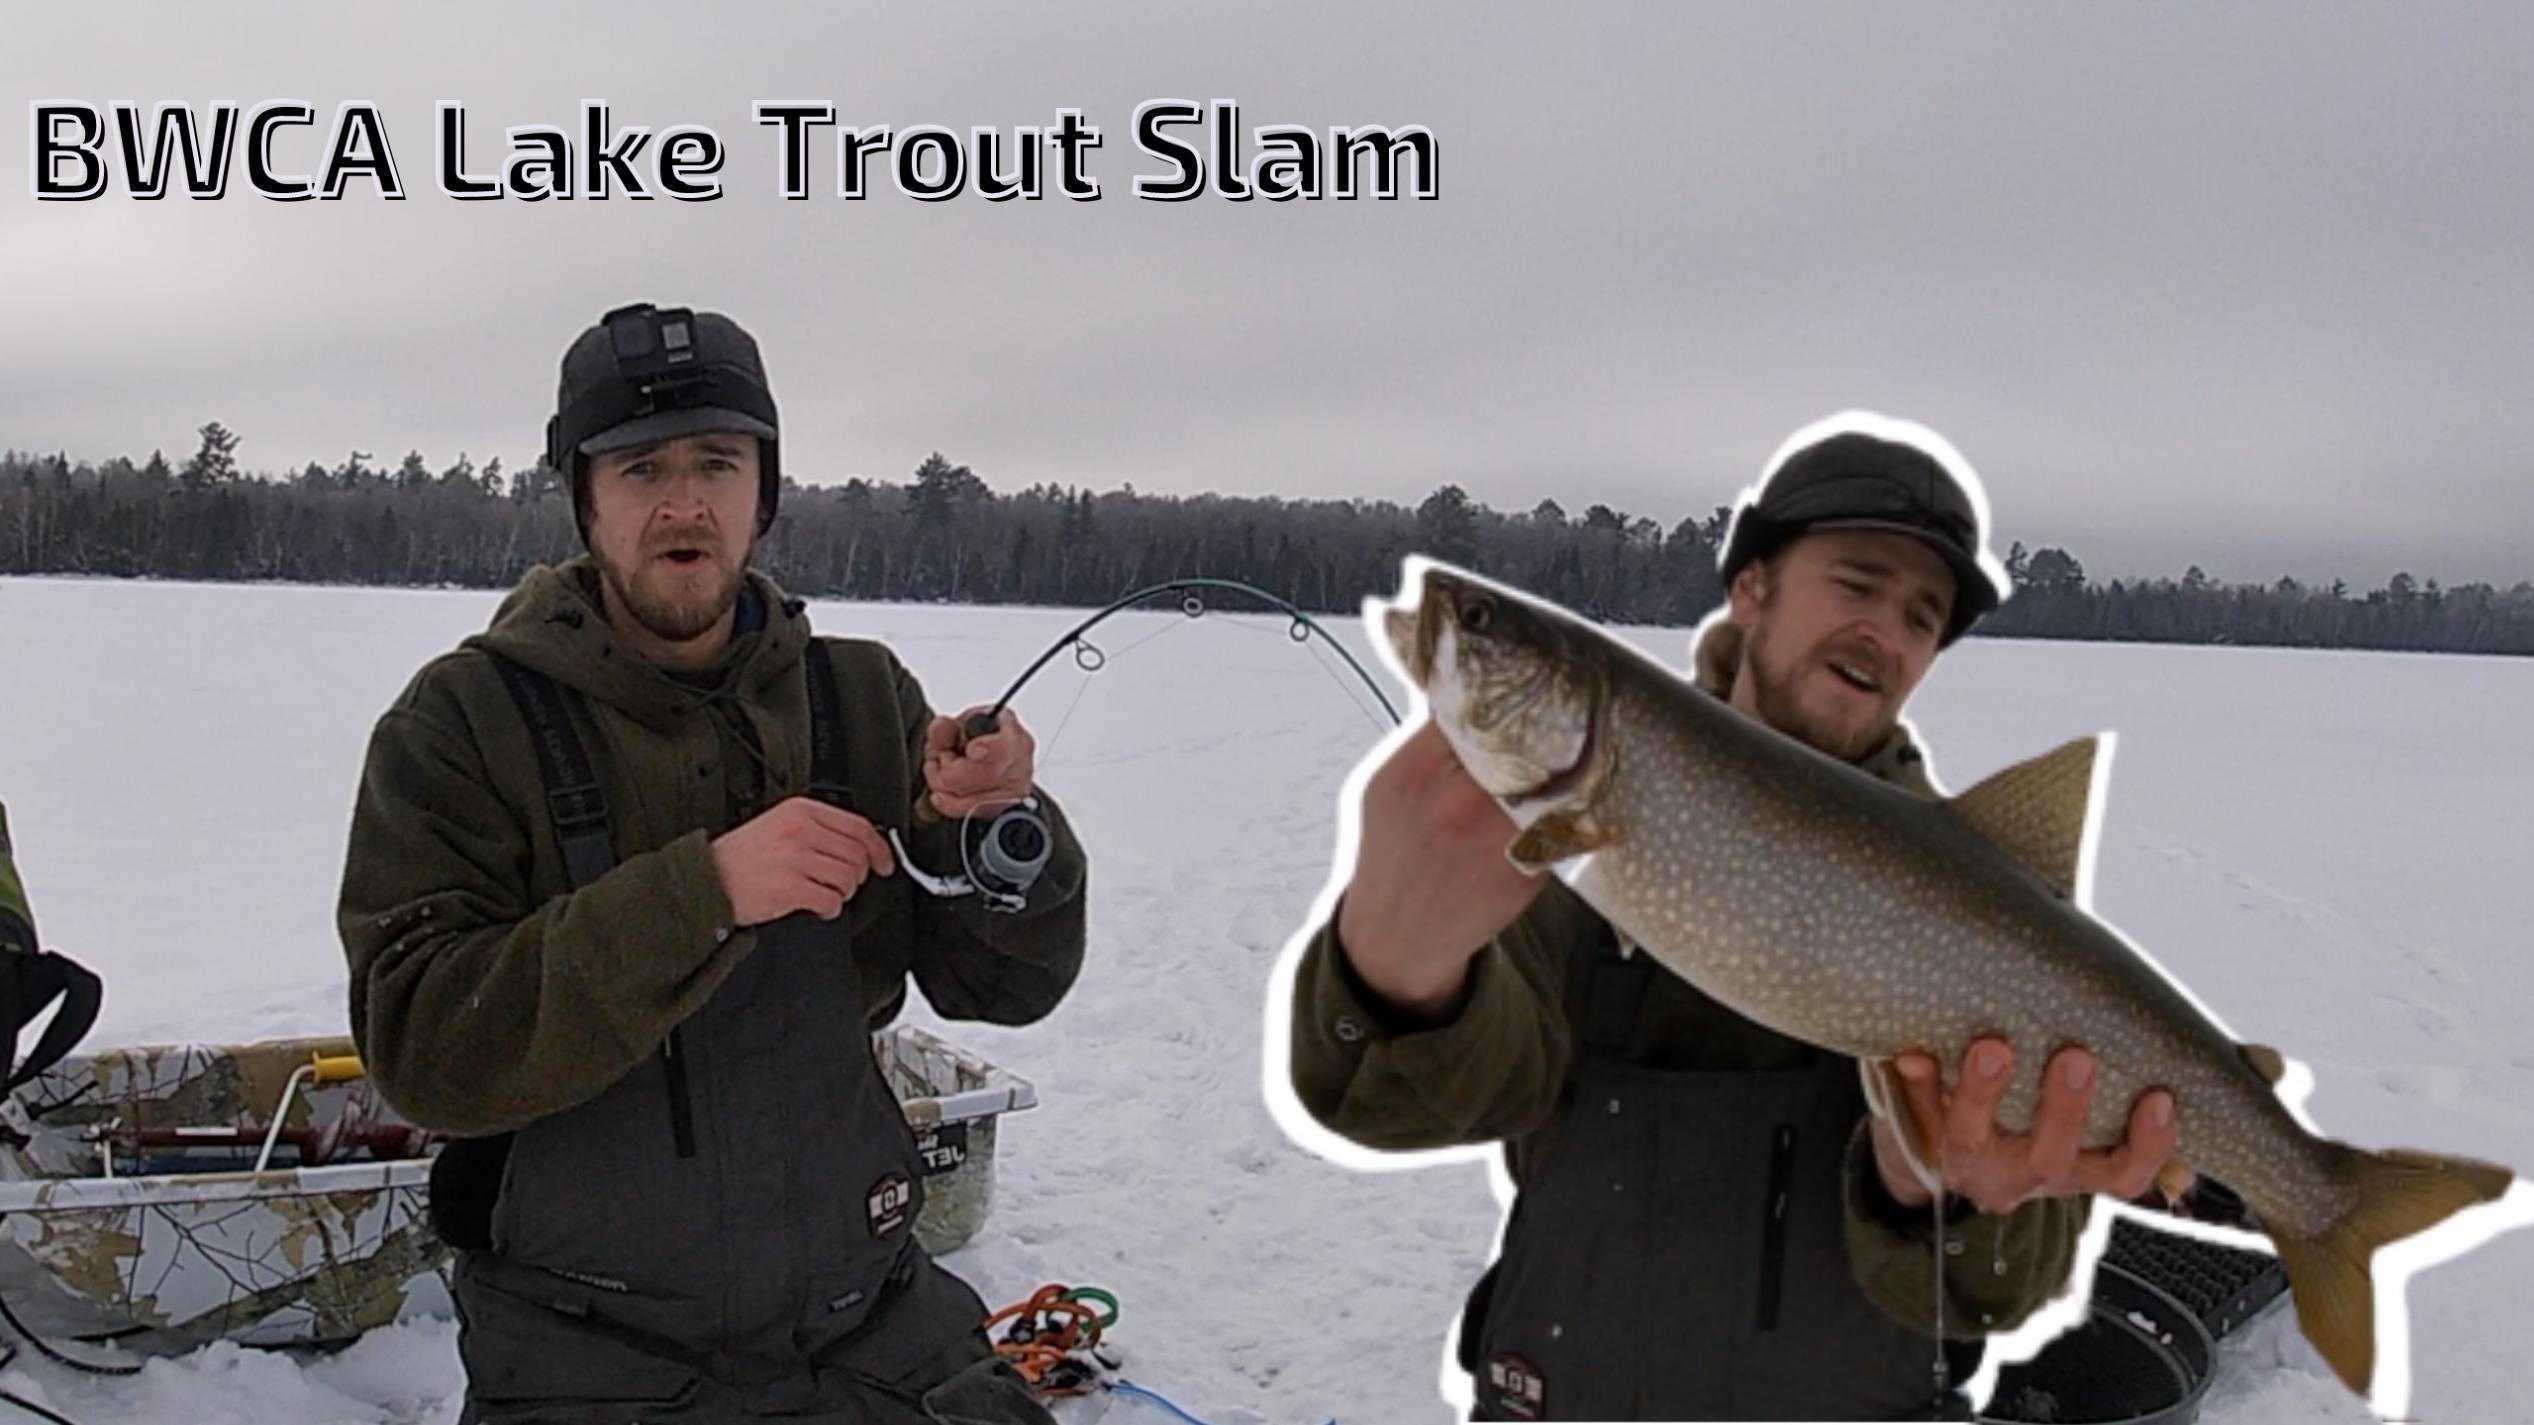 BWCA Lake Trout Slam 2021